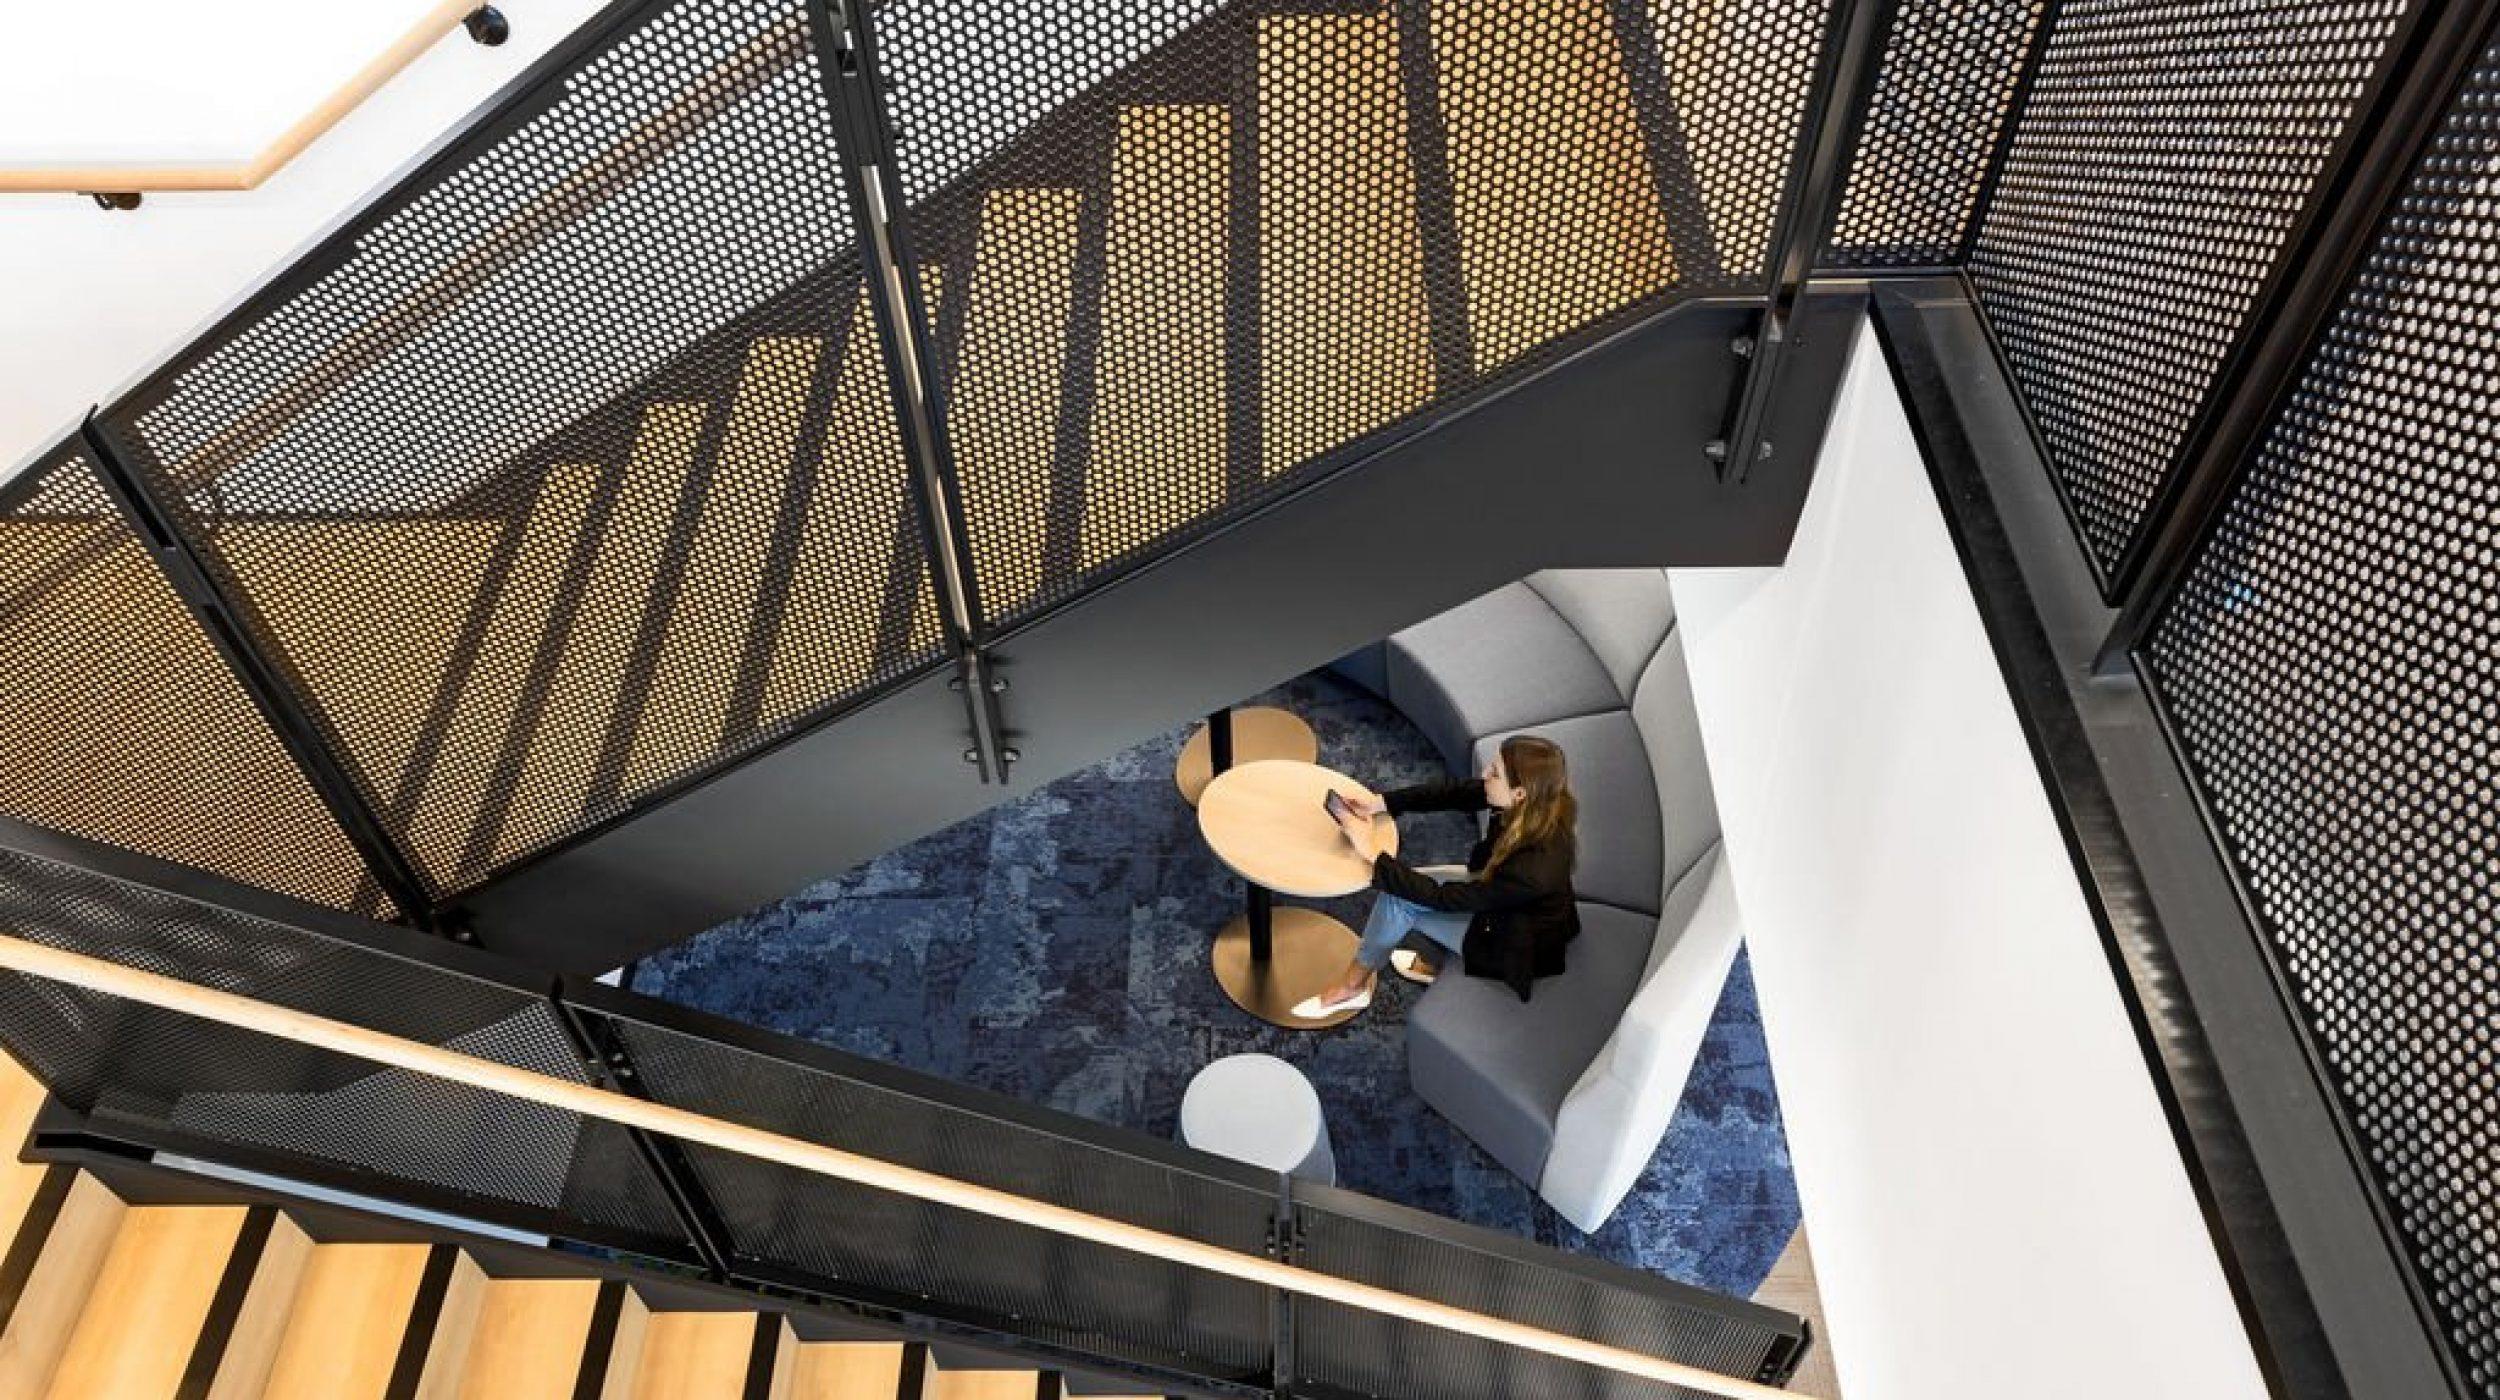 Mesh Steel Staircase | Sydney Water | Active Metal 06